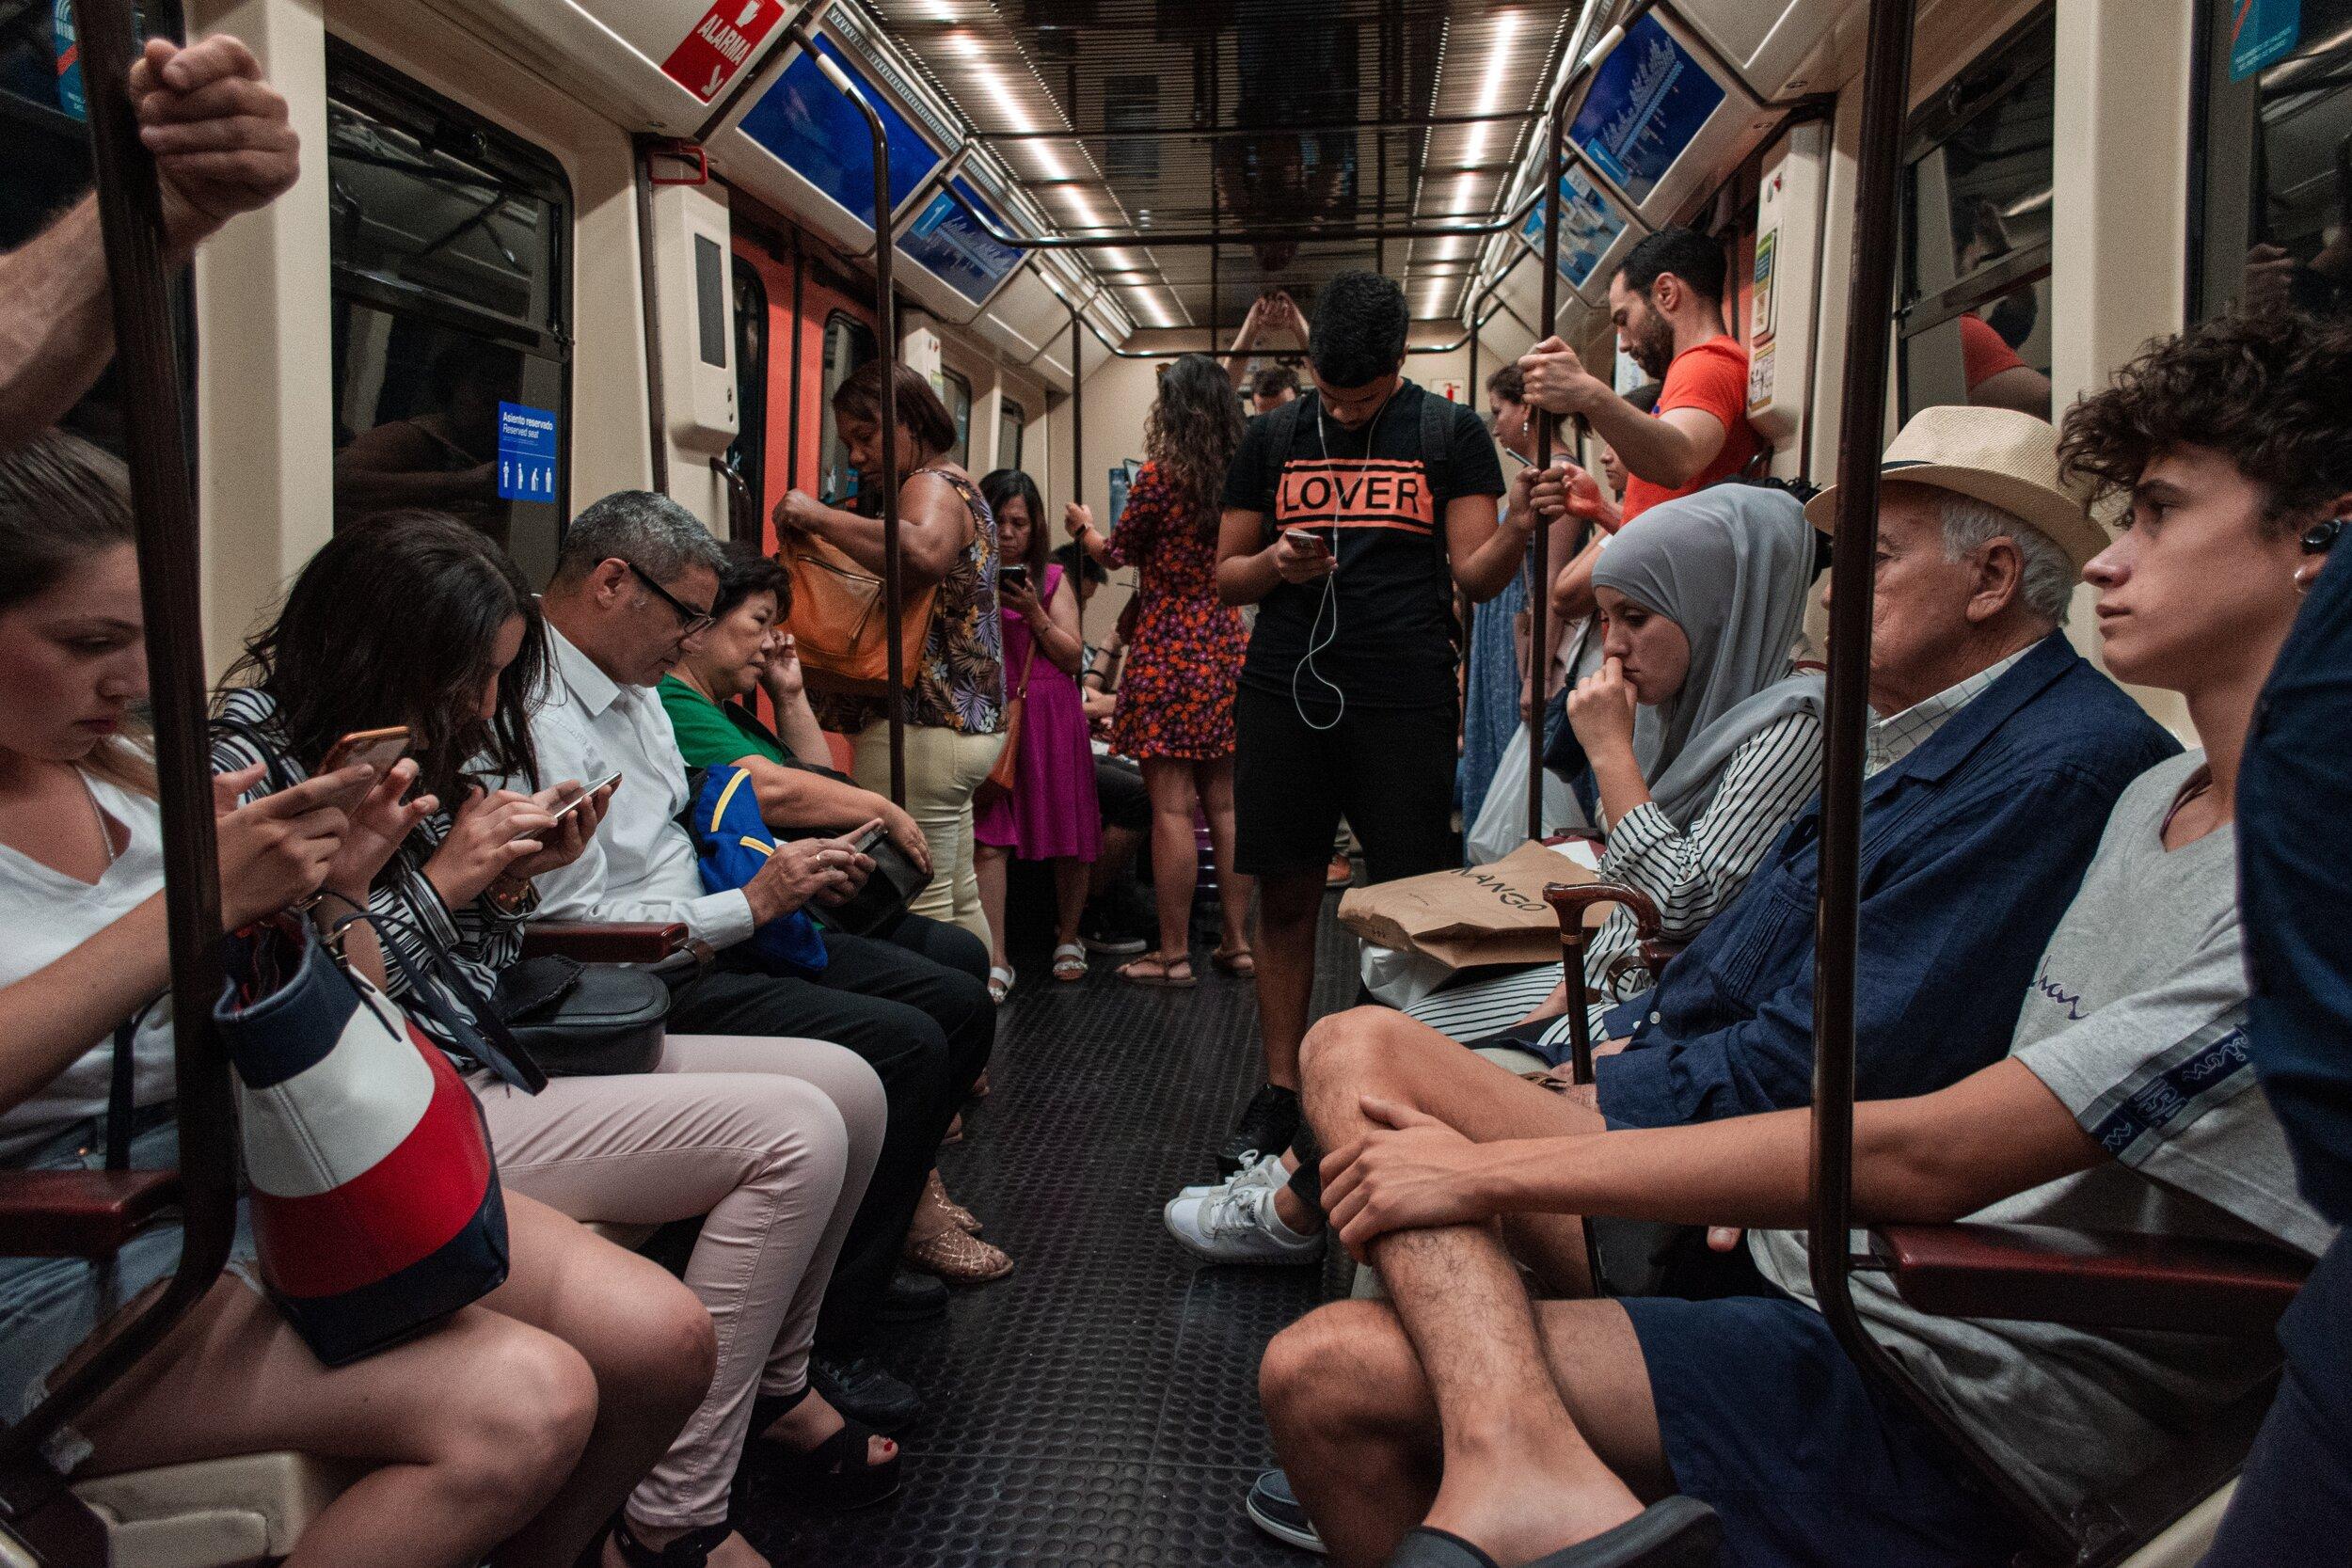 Auxiliares de conversación in Madrid taking the Metro to work teaching English